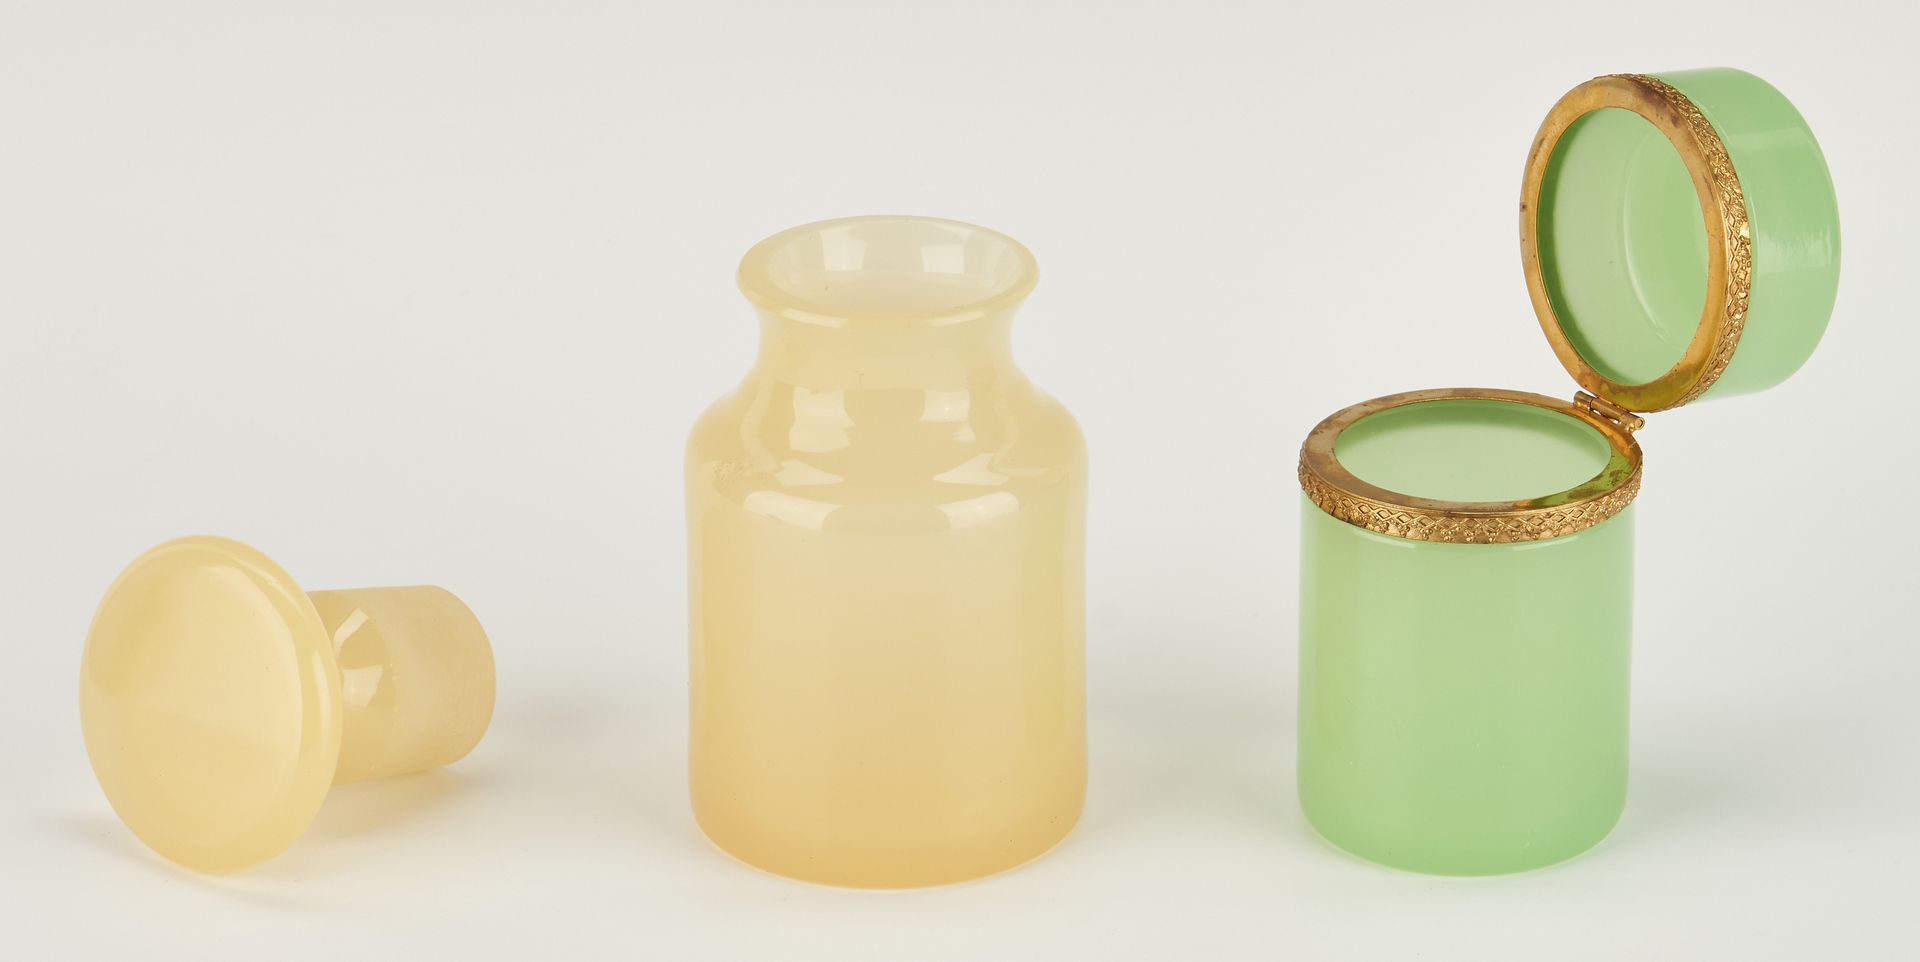 Lot 876: 12 Cenedese Murano Glass Decorative Items